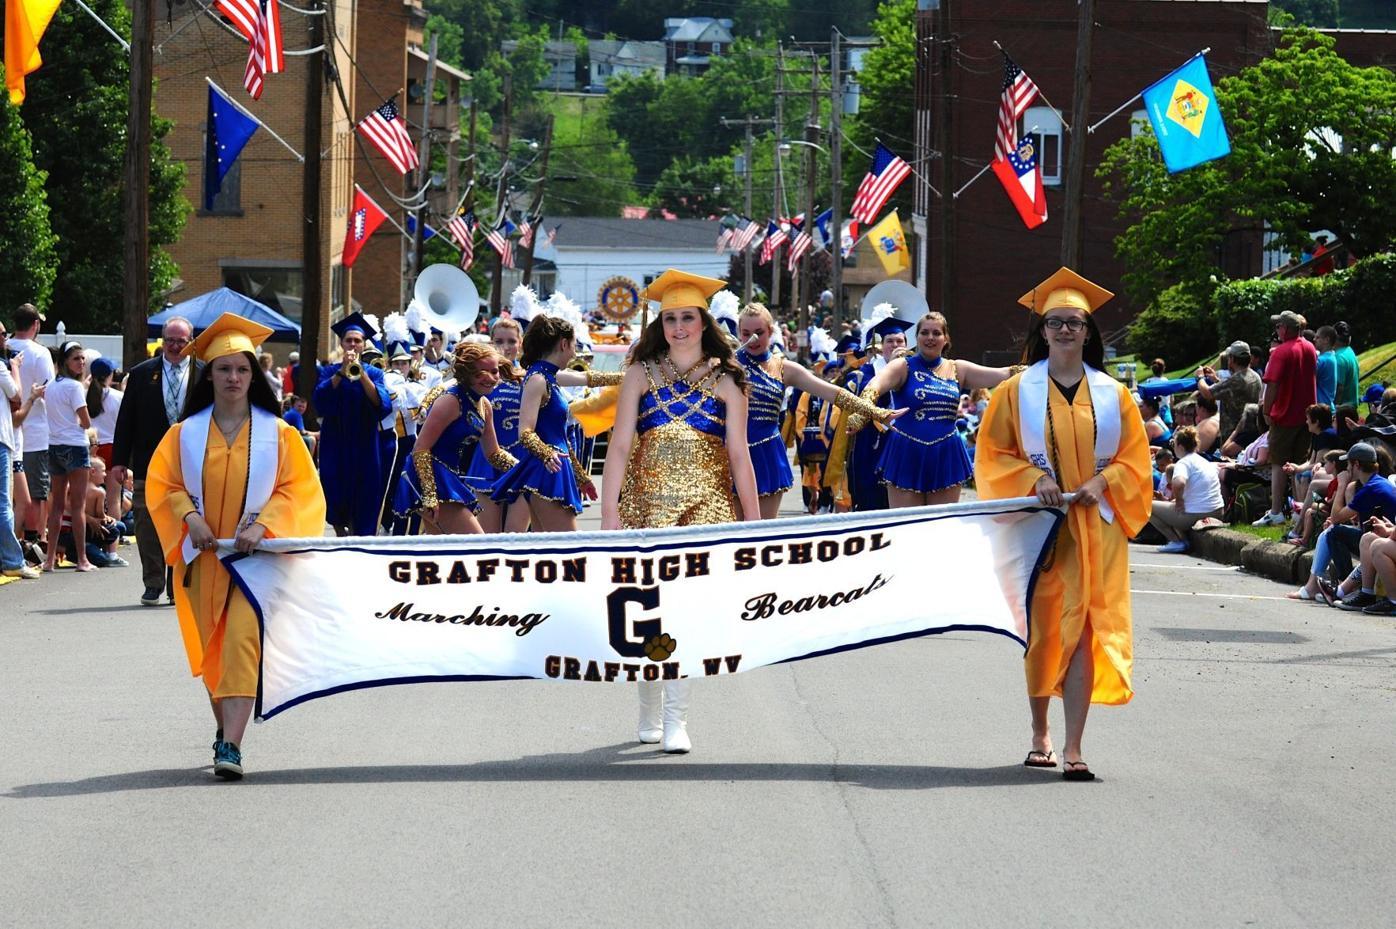 Grafton high band